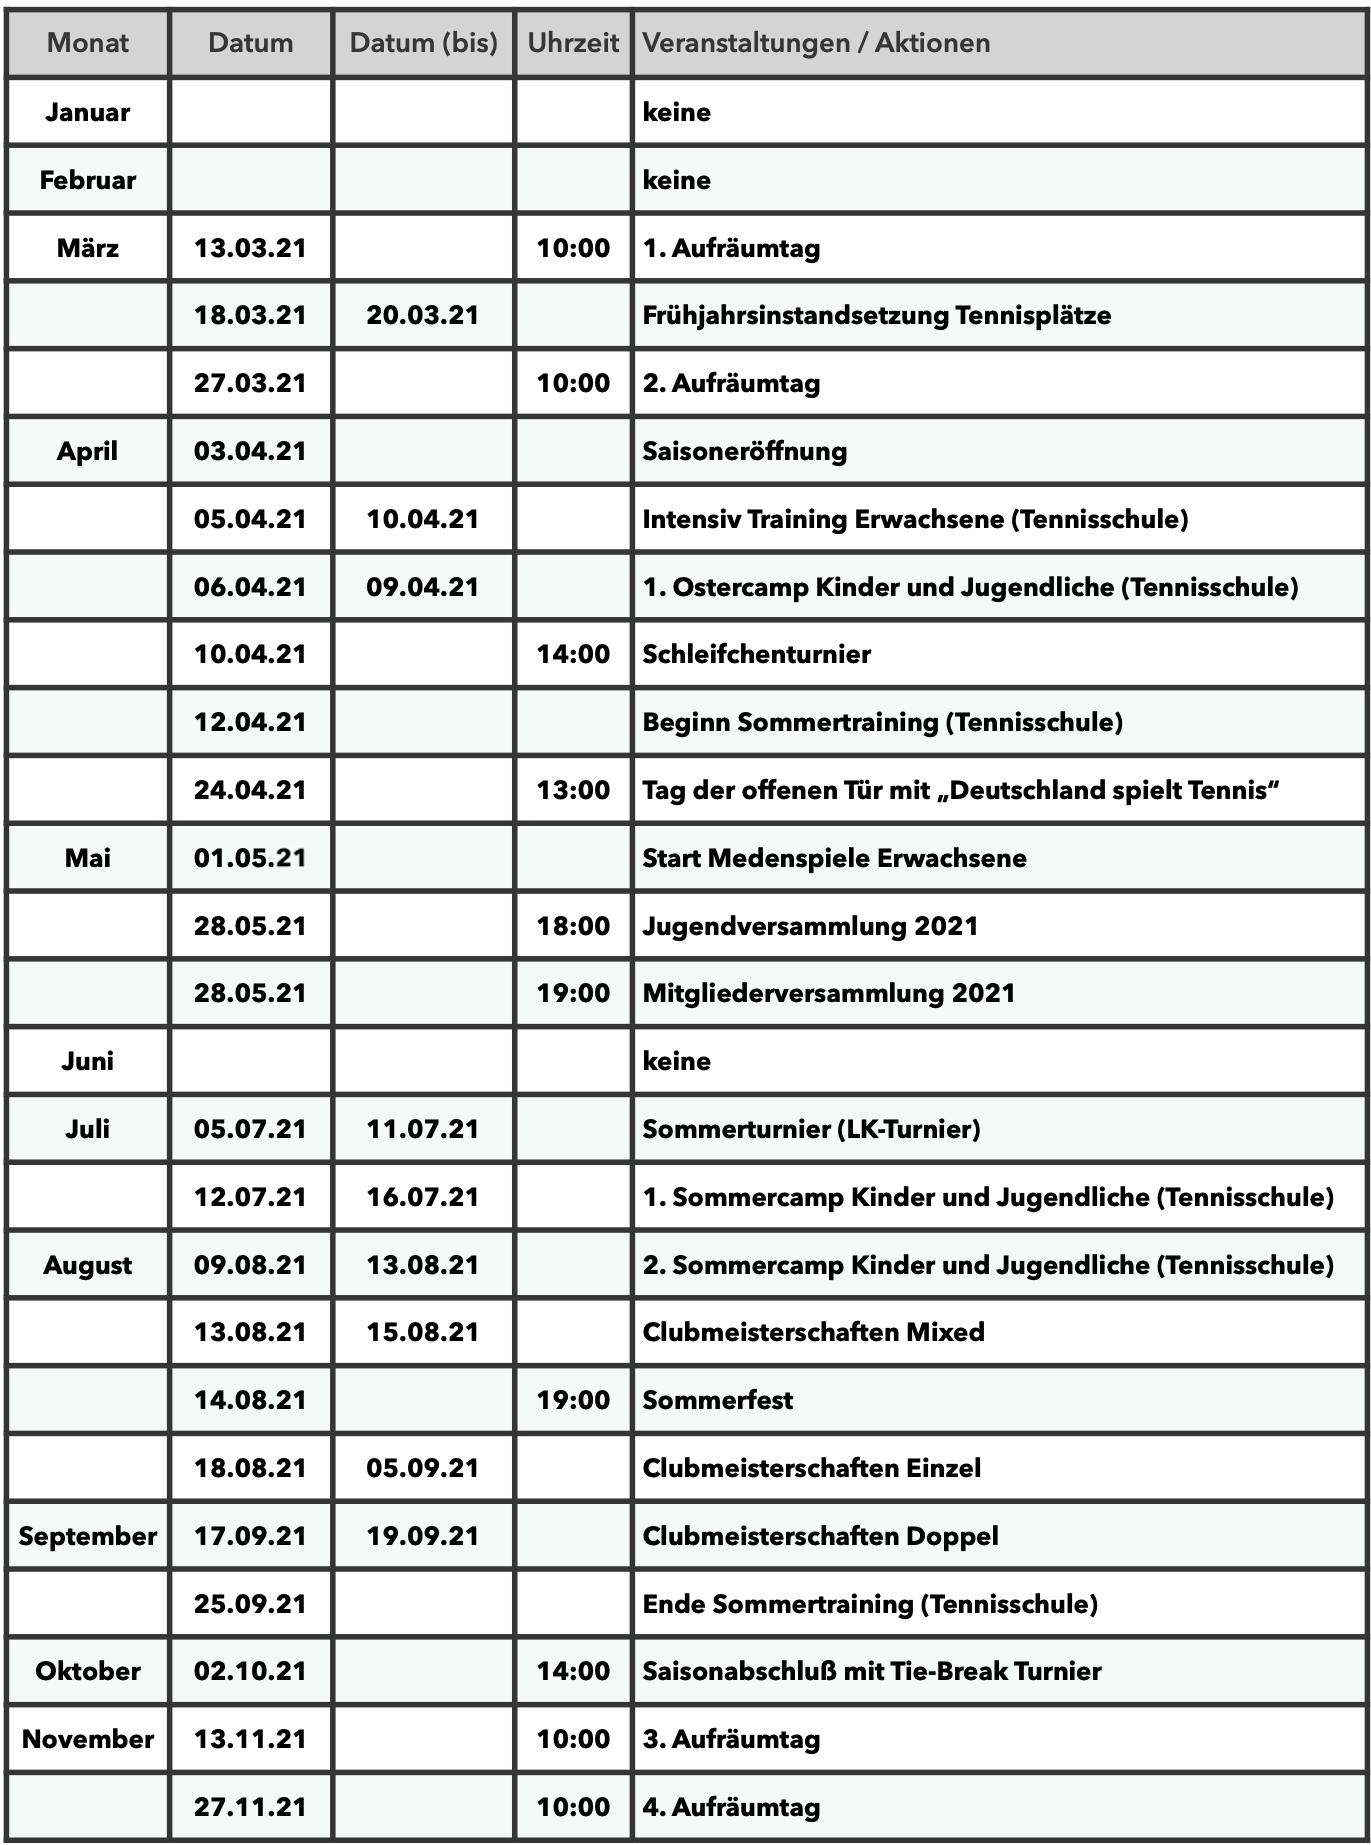 KTC_Terminliste_2021_aktualisiert